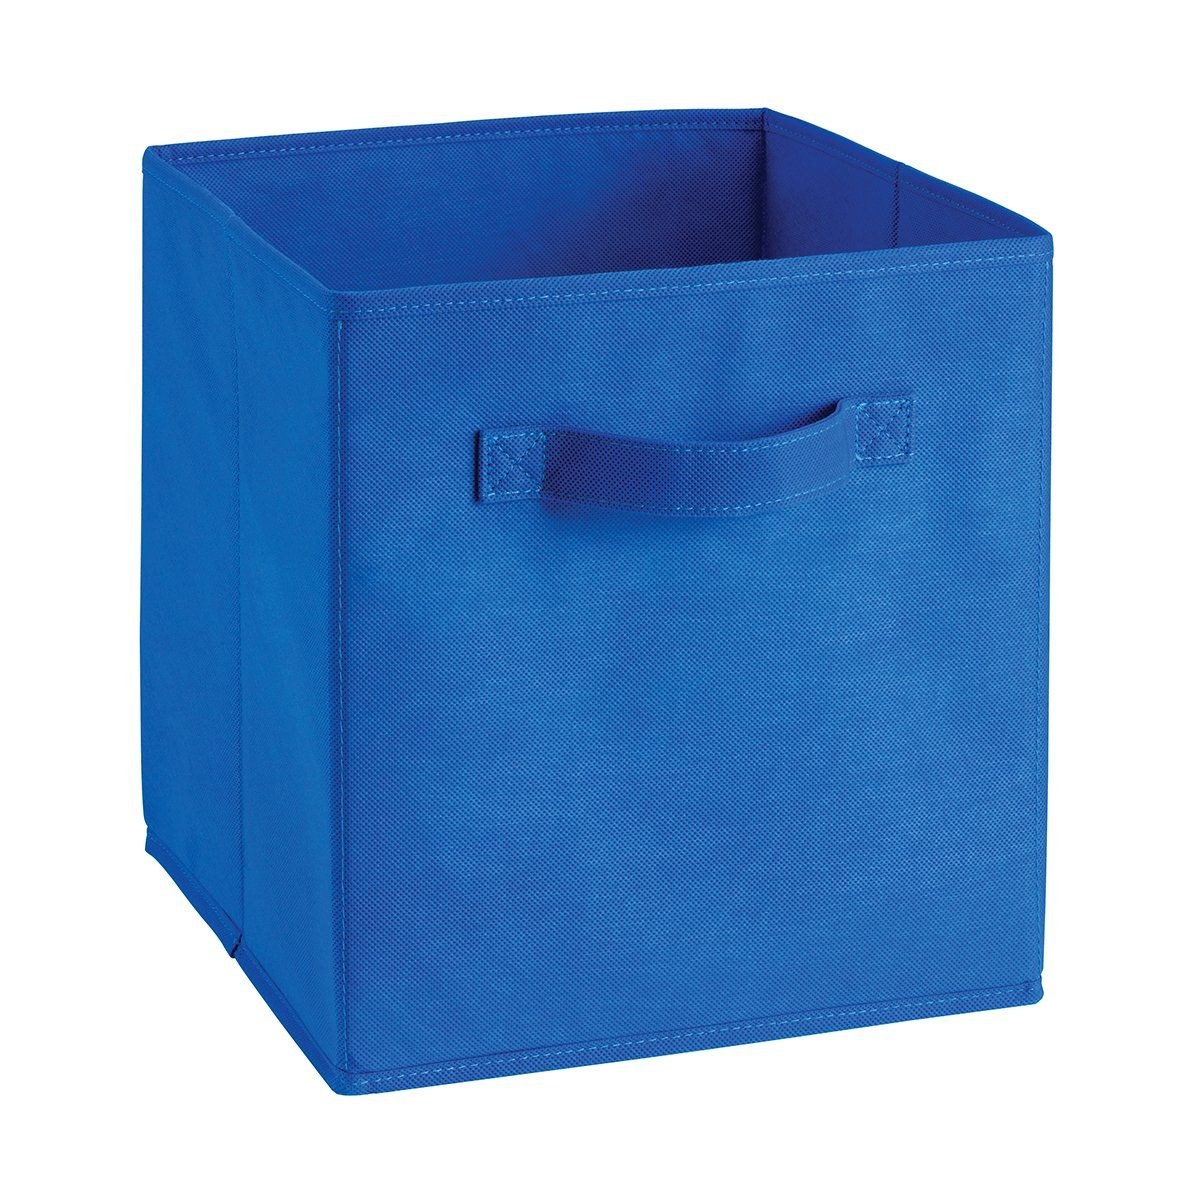 Amazon.com   ClosetMaid 8699 Fabric Drawer, Royal Blue   Closet Storage And  Organization